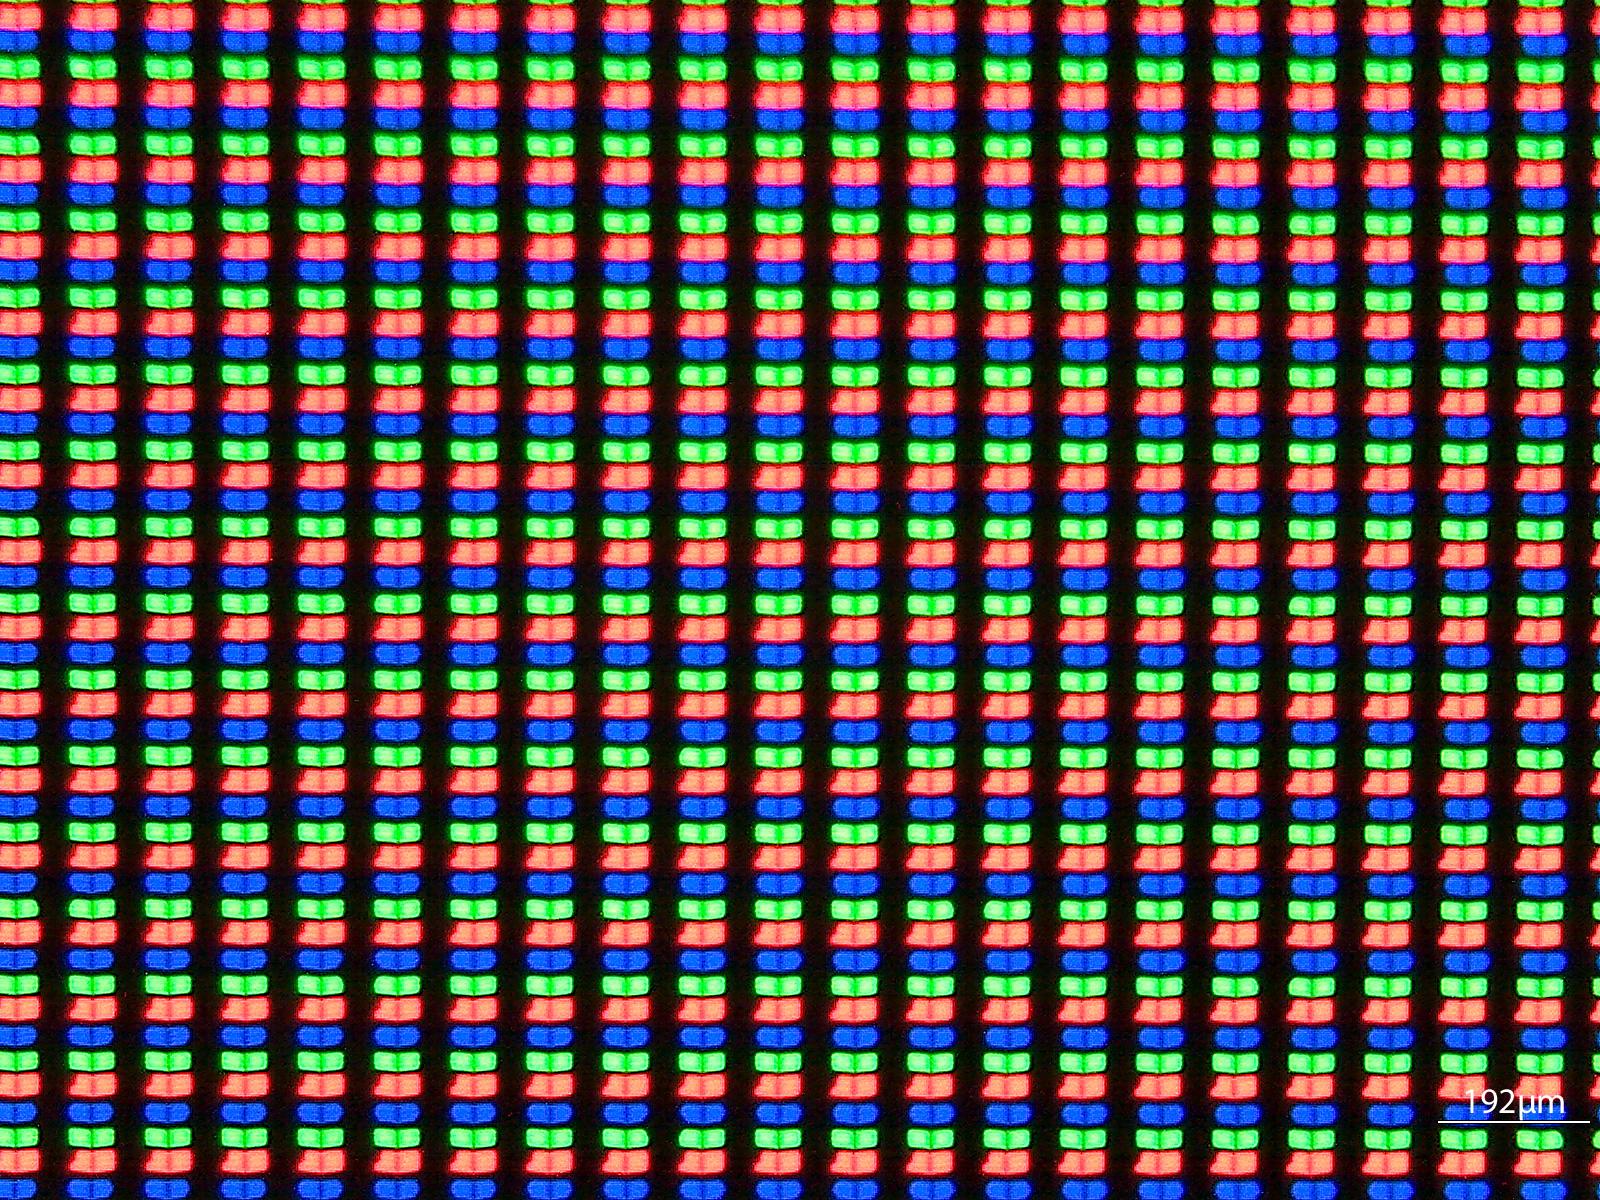 Going Into the Pixel: Retina Display Under a Microscope - The new iPad: Retina Display Analysis